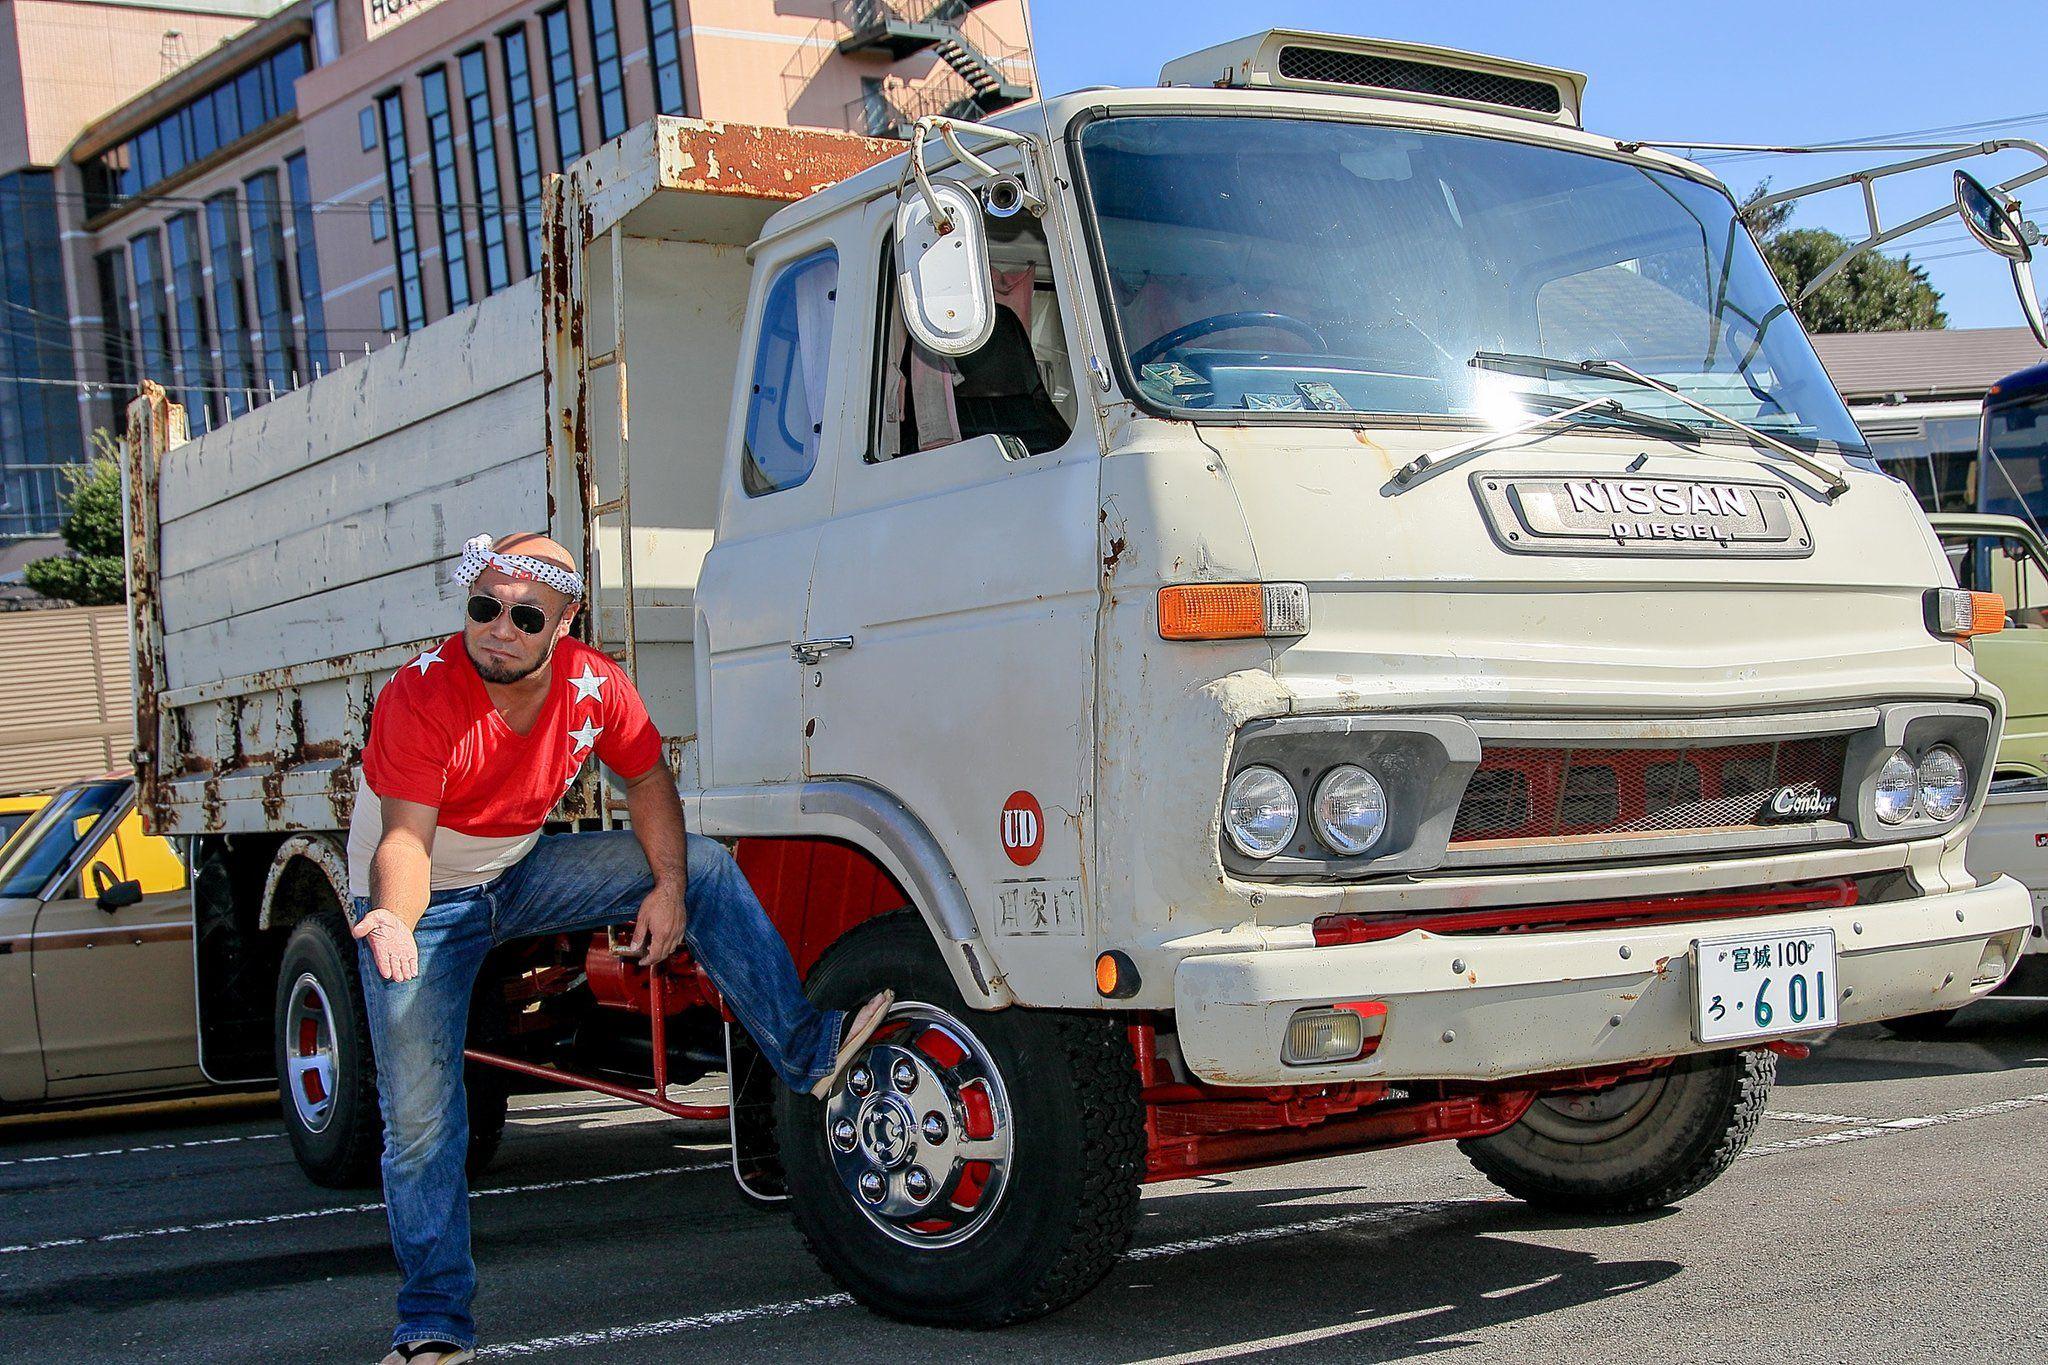 Camiones Clasico おしゃれまとめの人気アイデア Pinterest Norberto Alvarado 2021 車 画像 旧 車 デコトラ